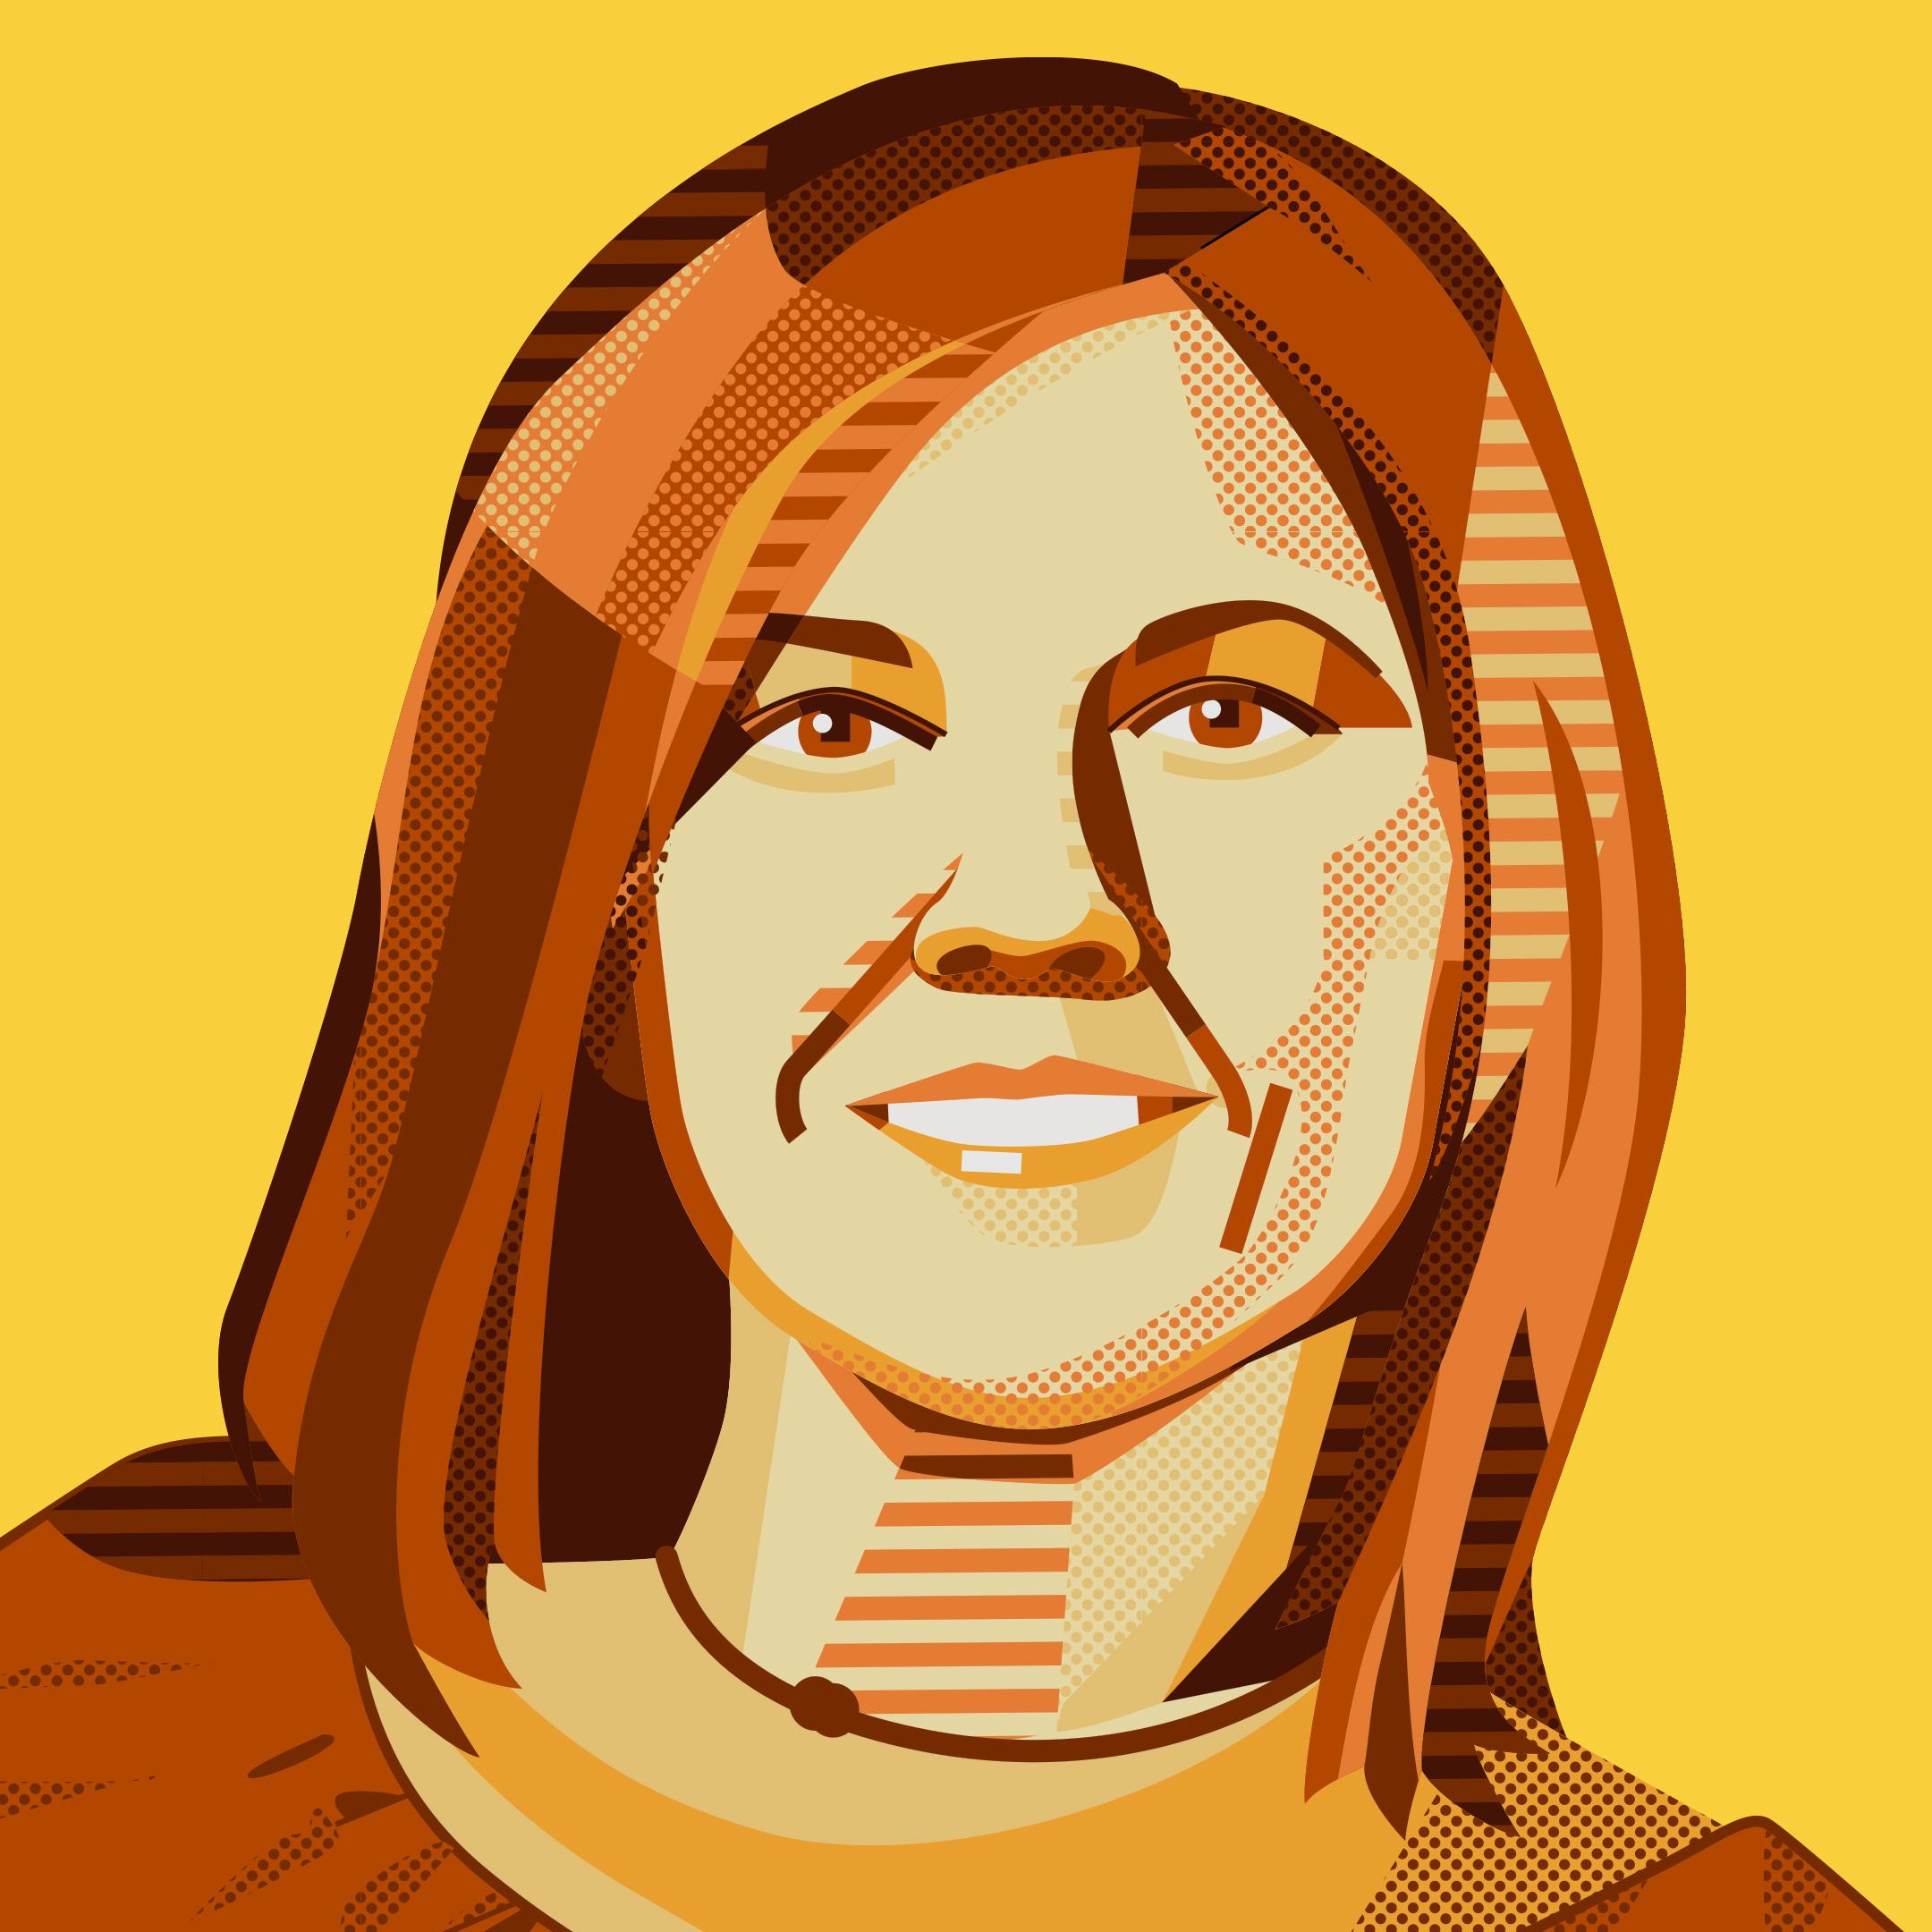 8-March26-Carol-Macpherson-Illustrative-Portrait_sq